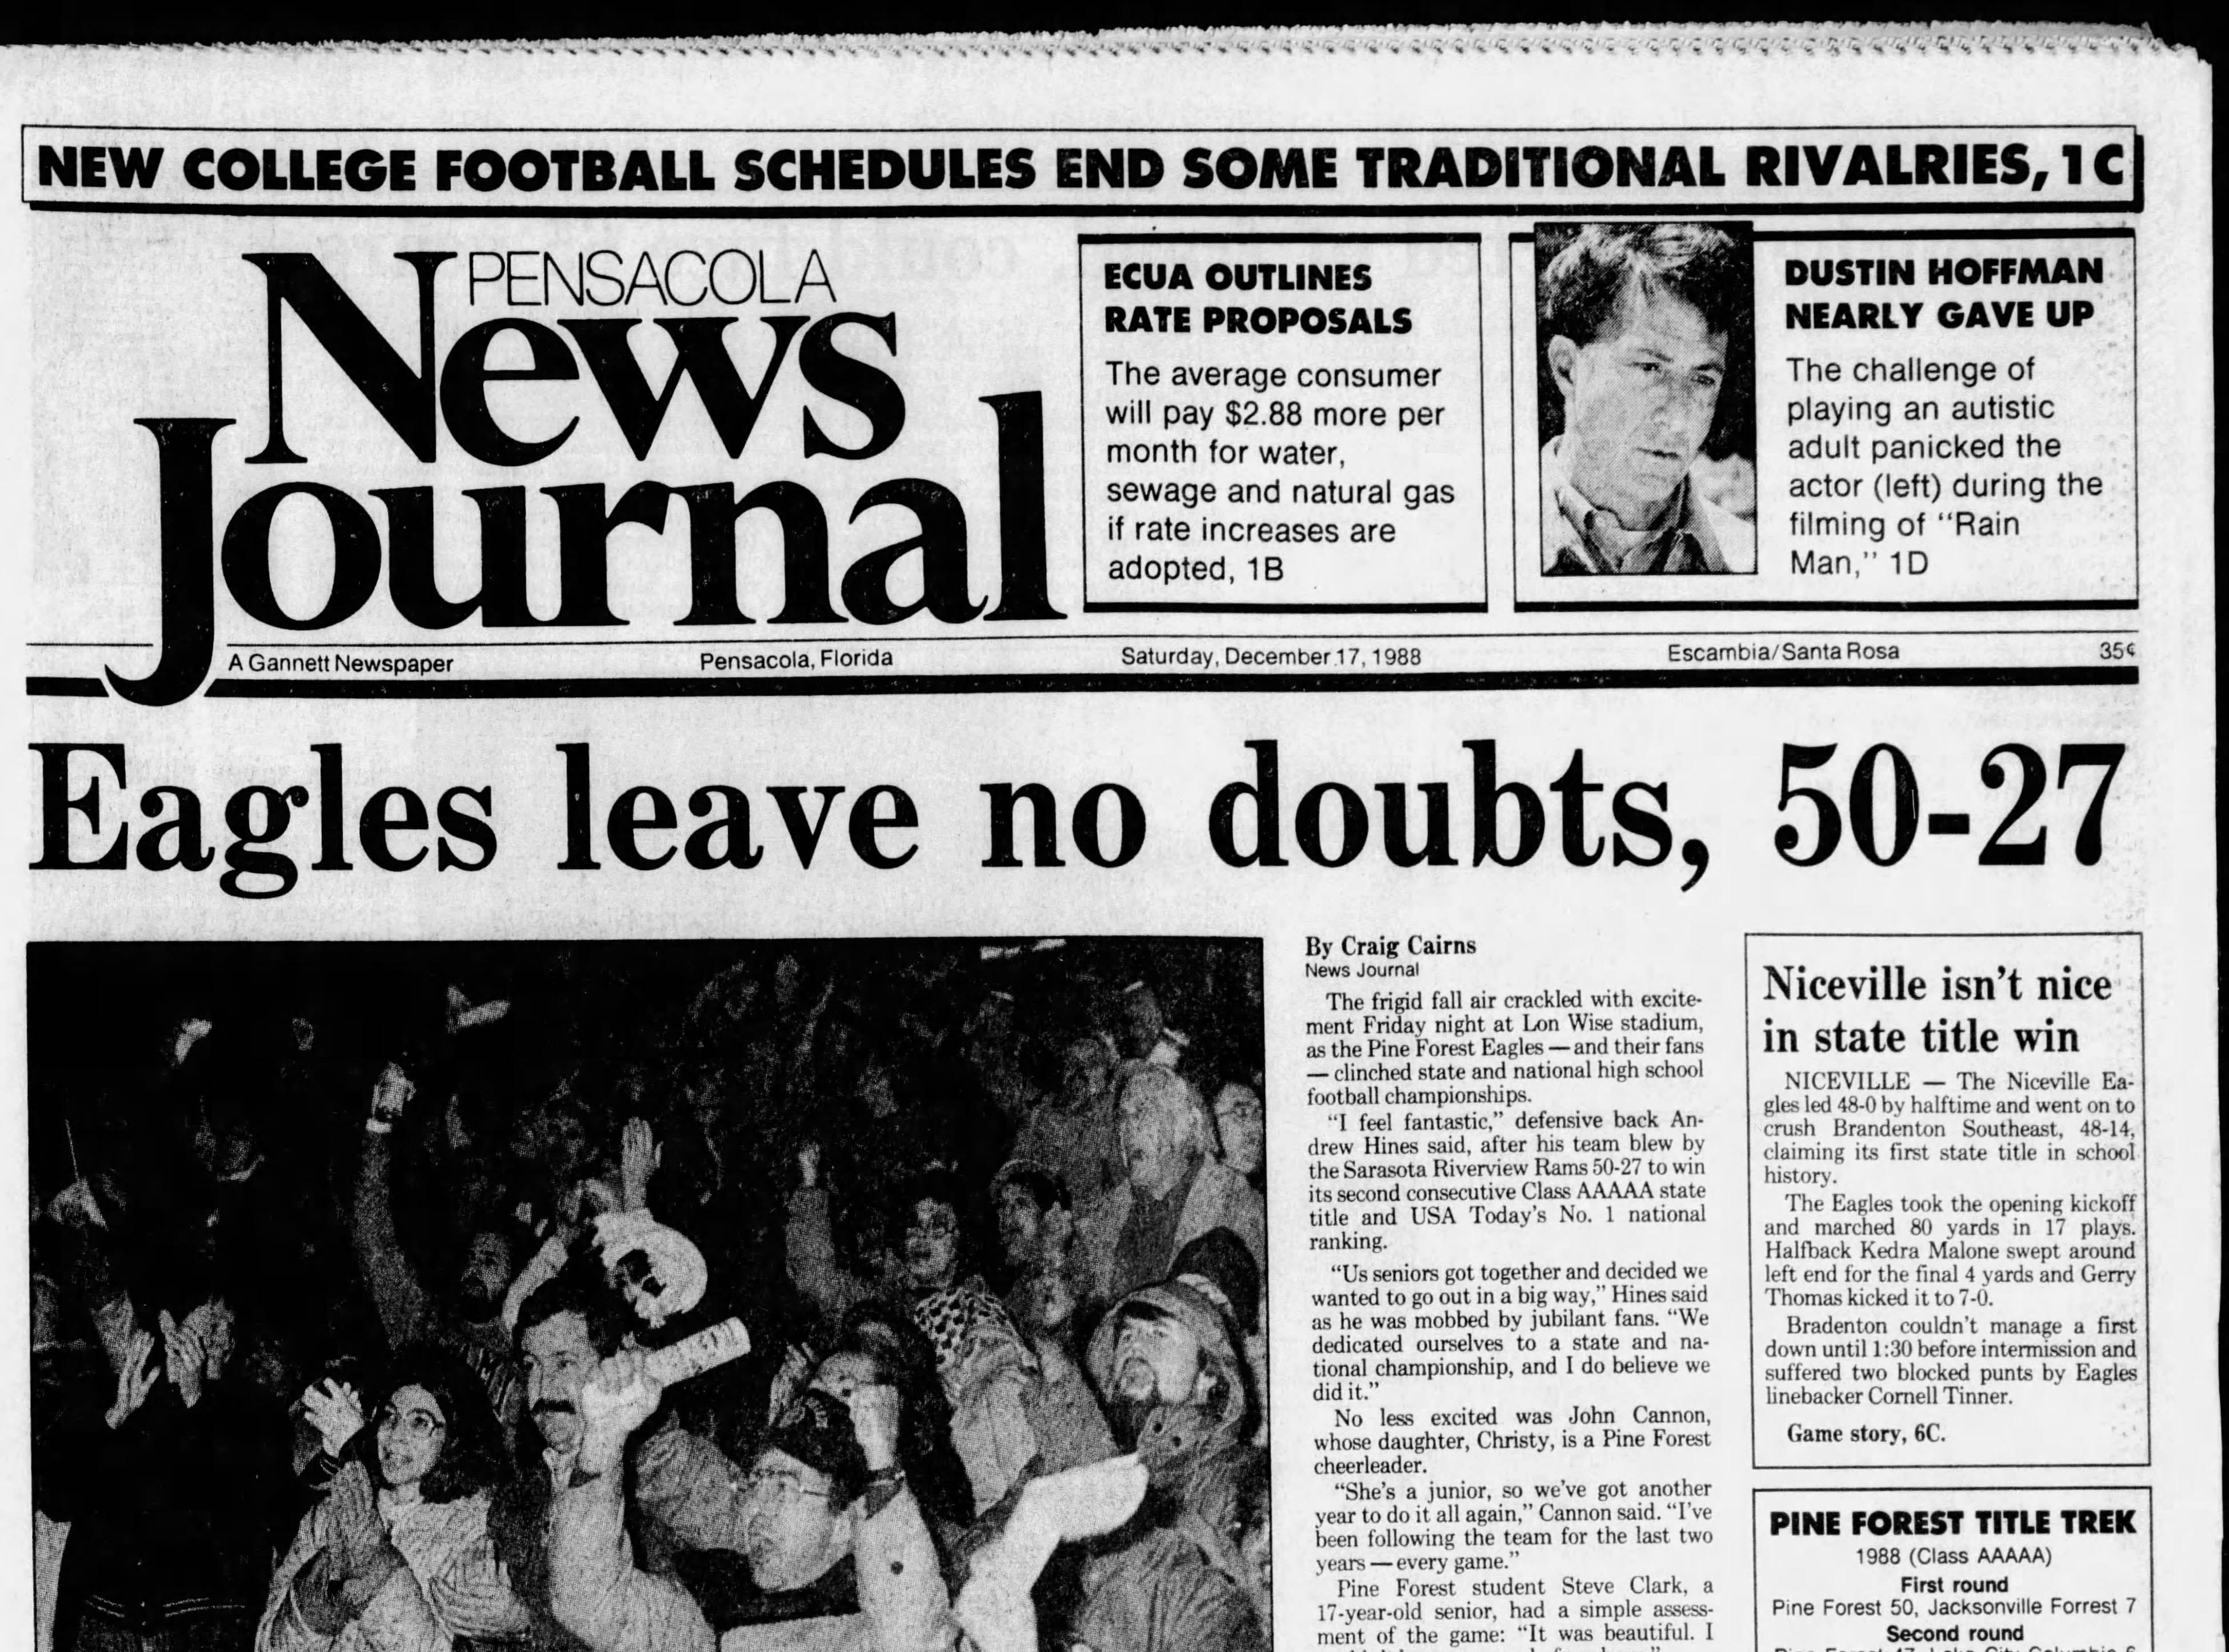 1988: Pine Forest defeats Sarasota Riverview, 50-27, for Class 5A title.